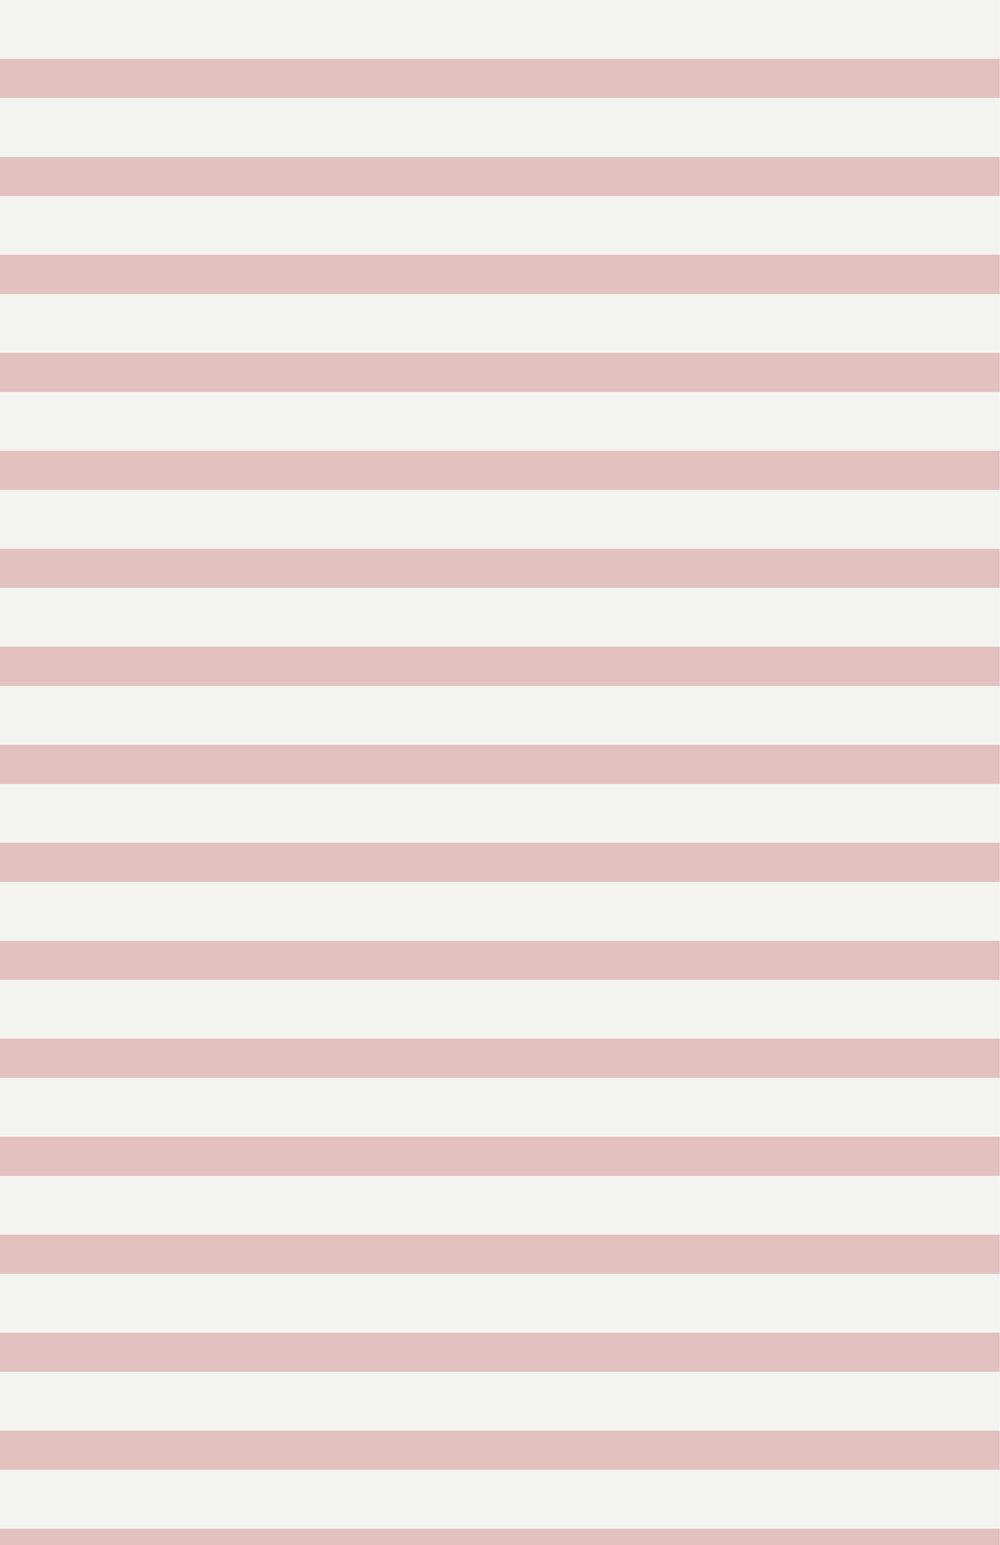 stripes-04.jpg